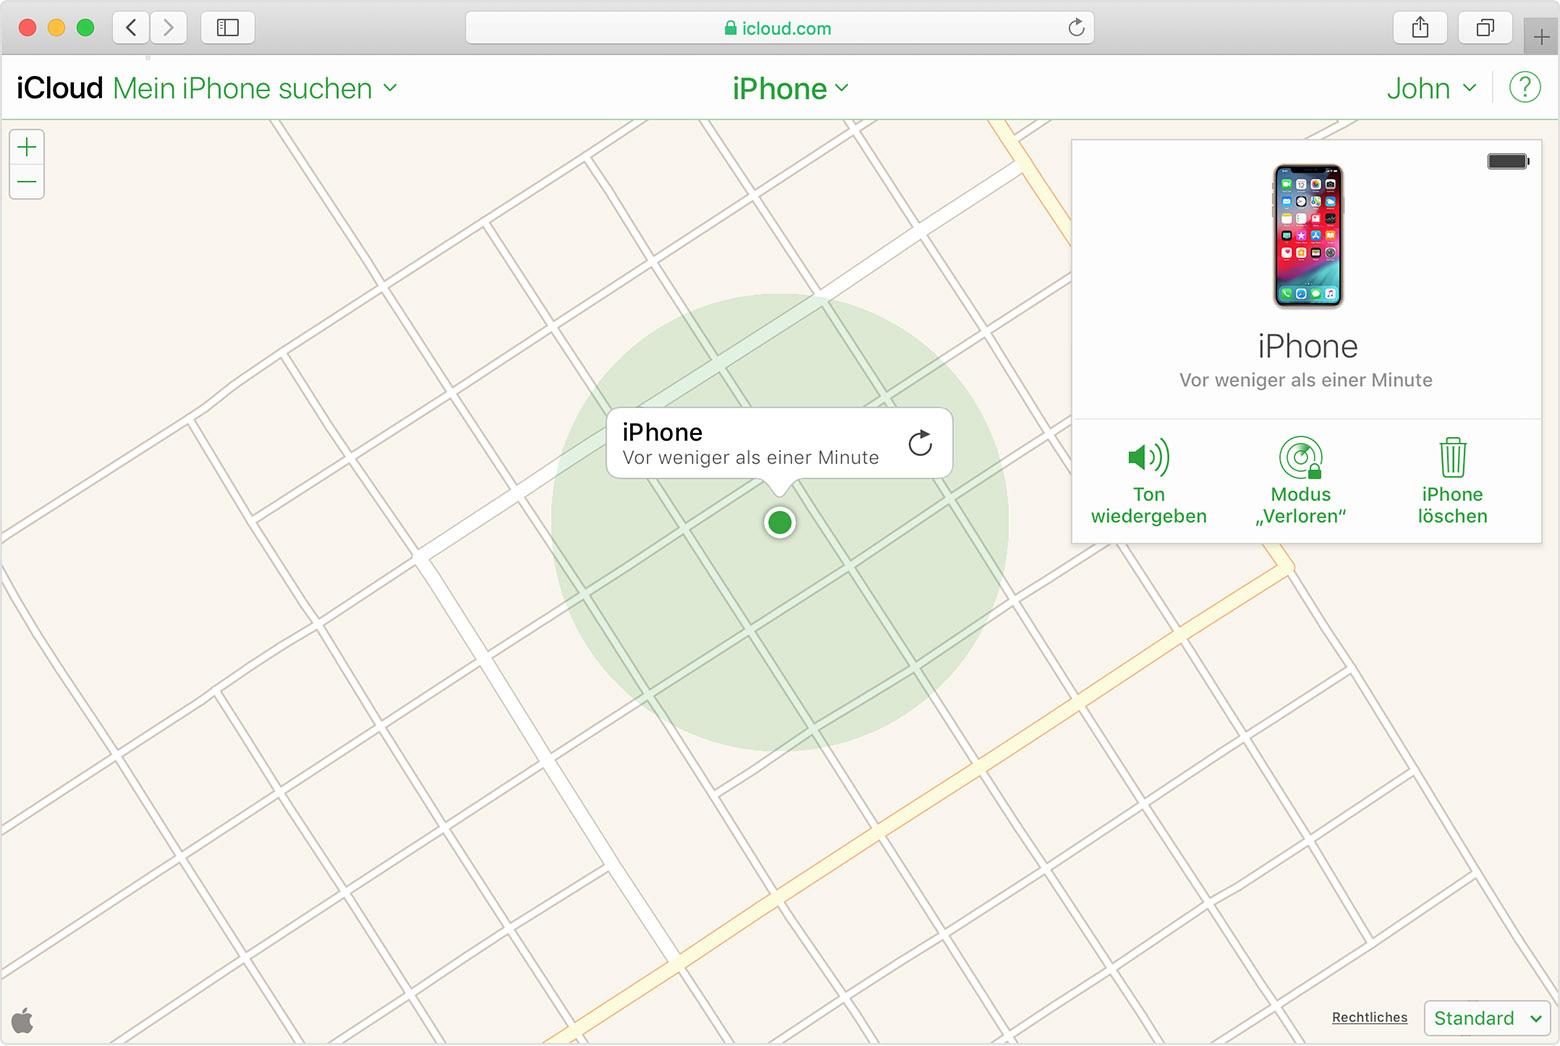 iPhone orten lassen – Mein iPhone suchen